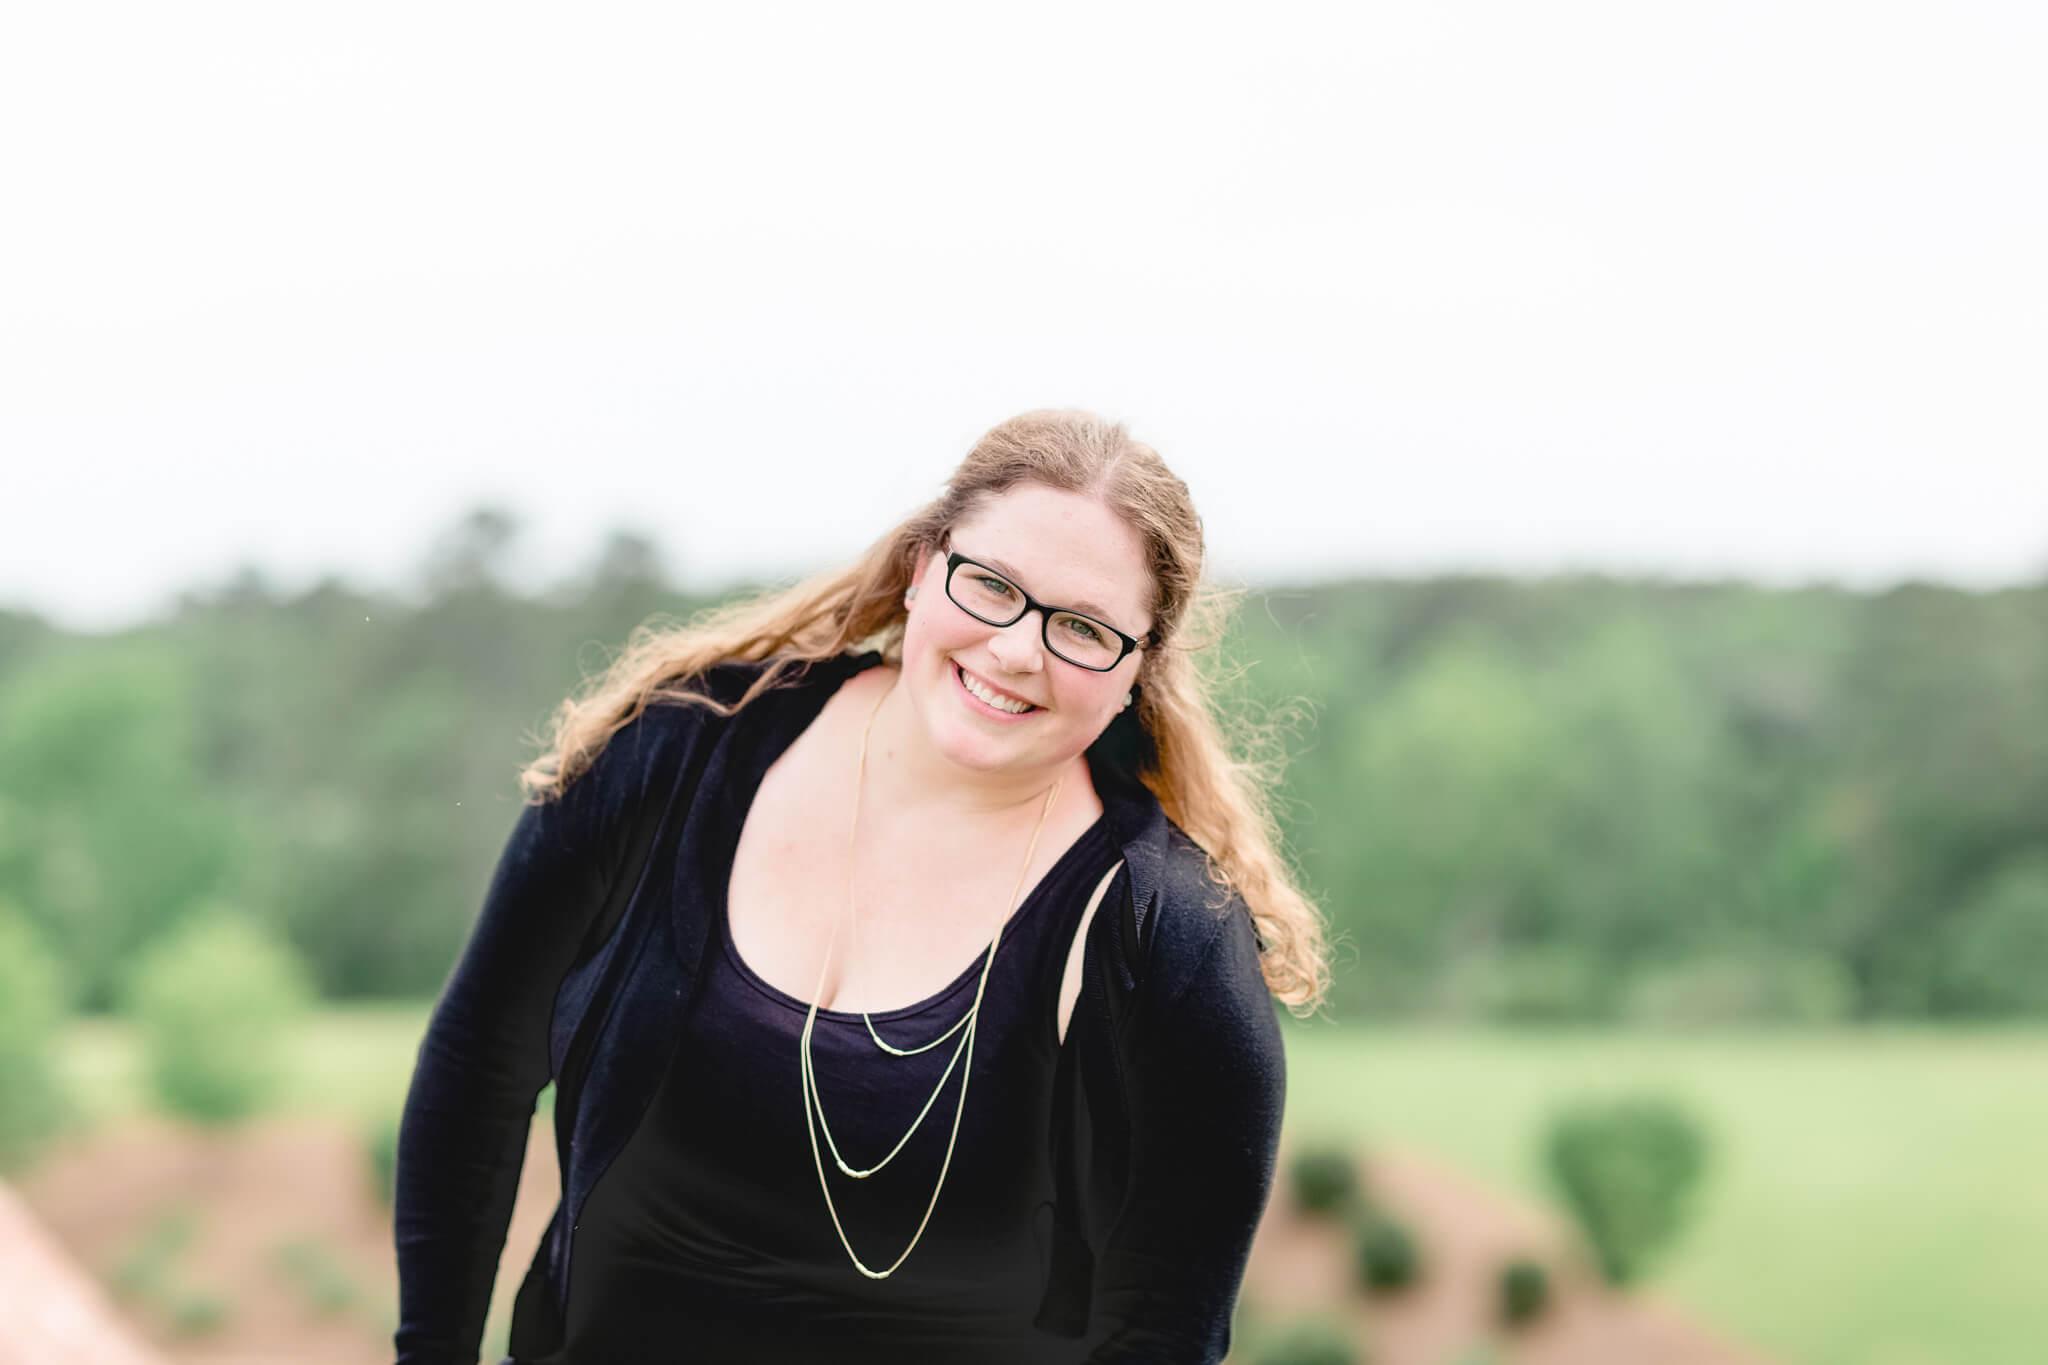 Courtney Liske at Connect 2017